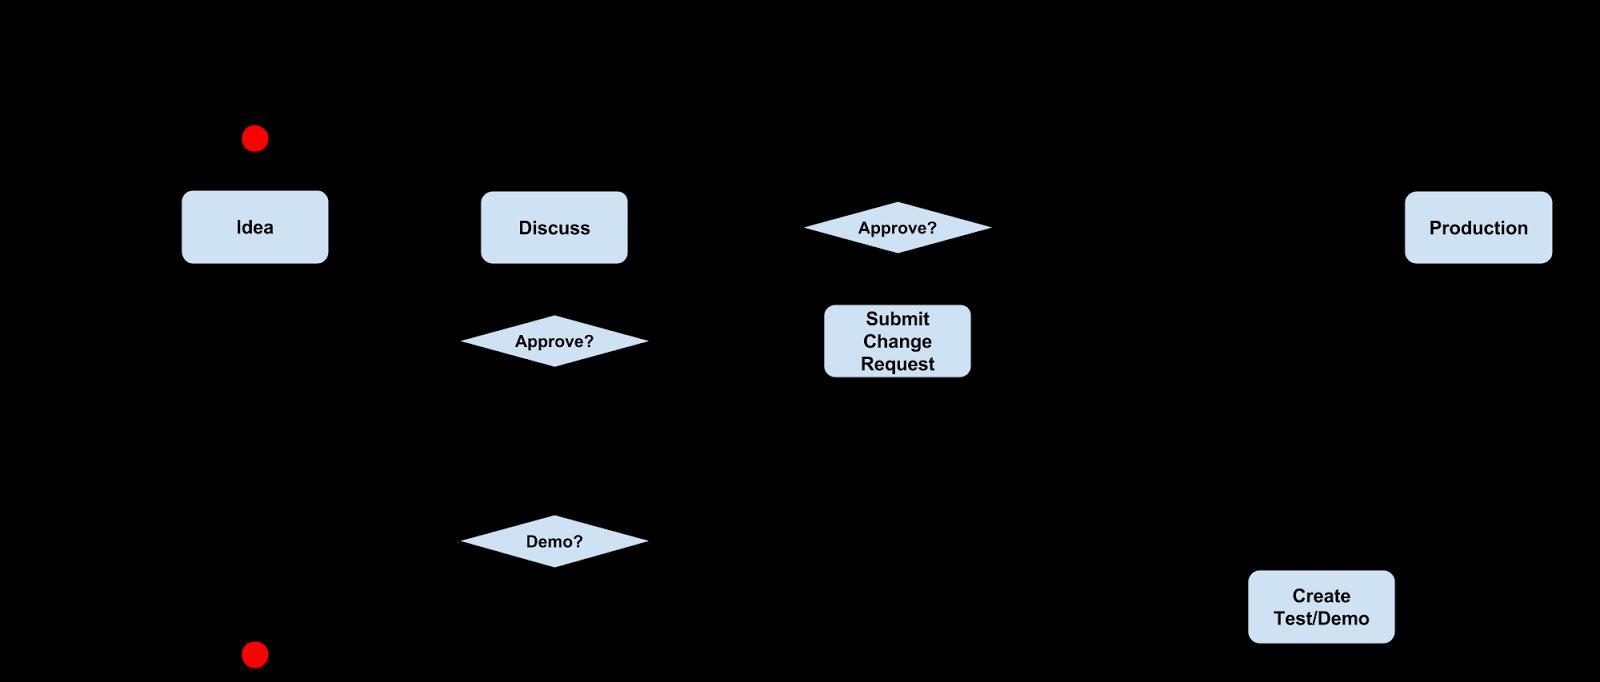 Eric Gagnon's Software Engineering Blog: Activity Diagram